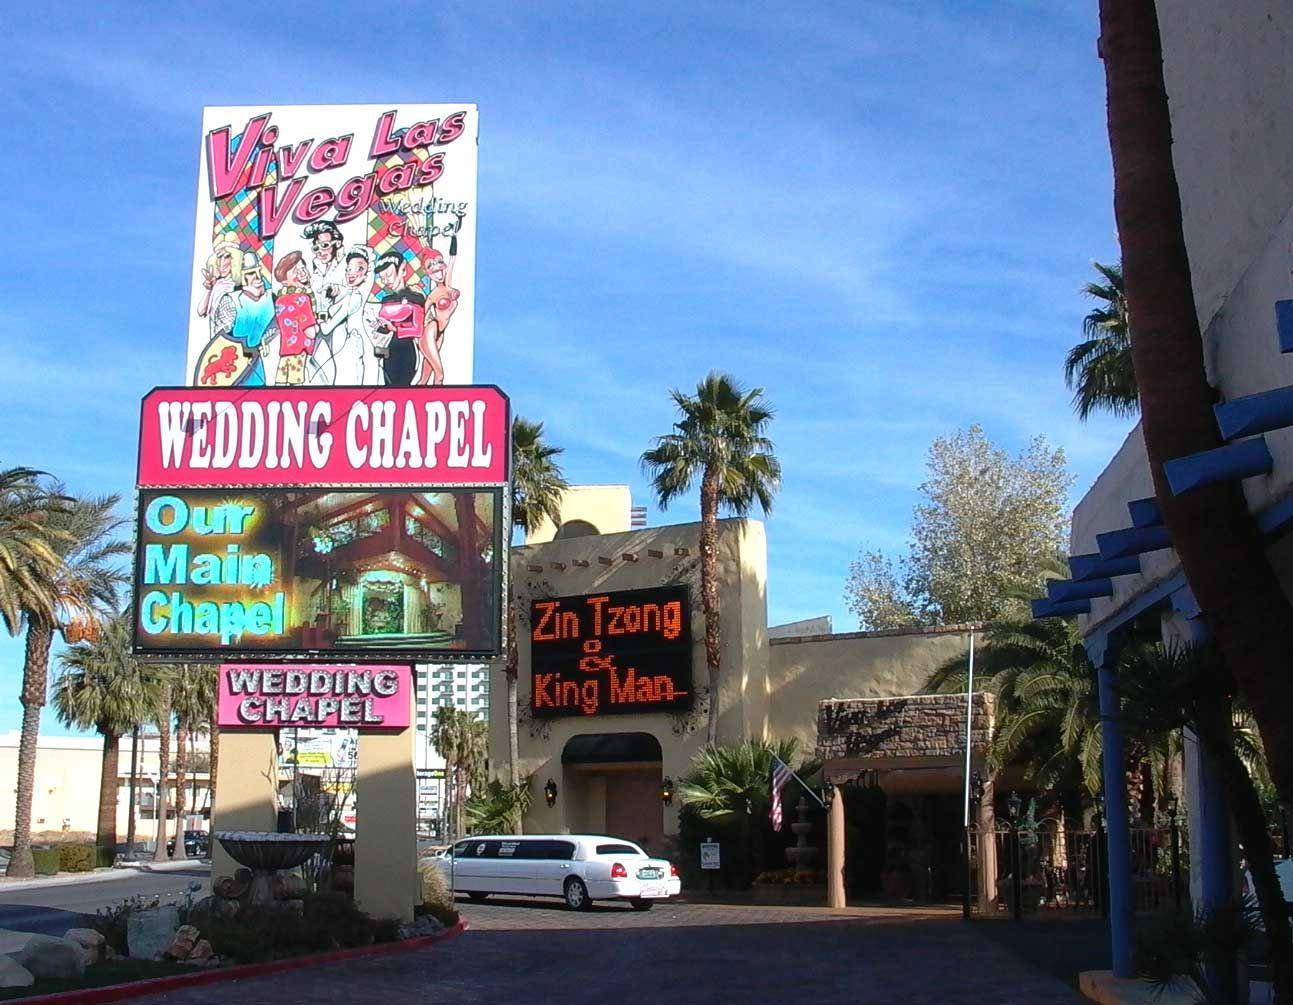 Viva Las Vegas Wedding Chapel Best Las Vegas Deals Las Vegas Wedding Chapel Chapel Wedding